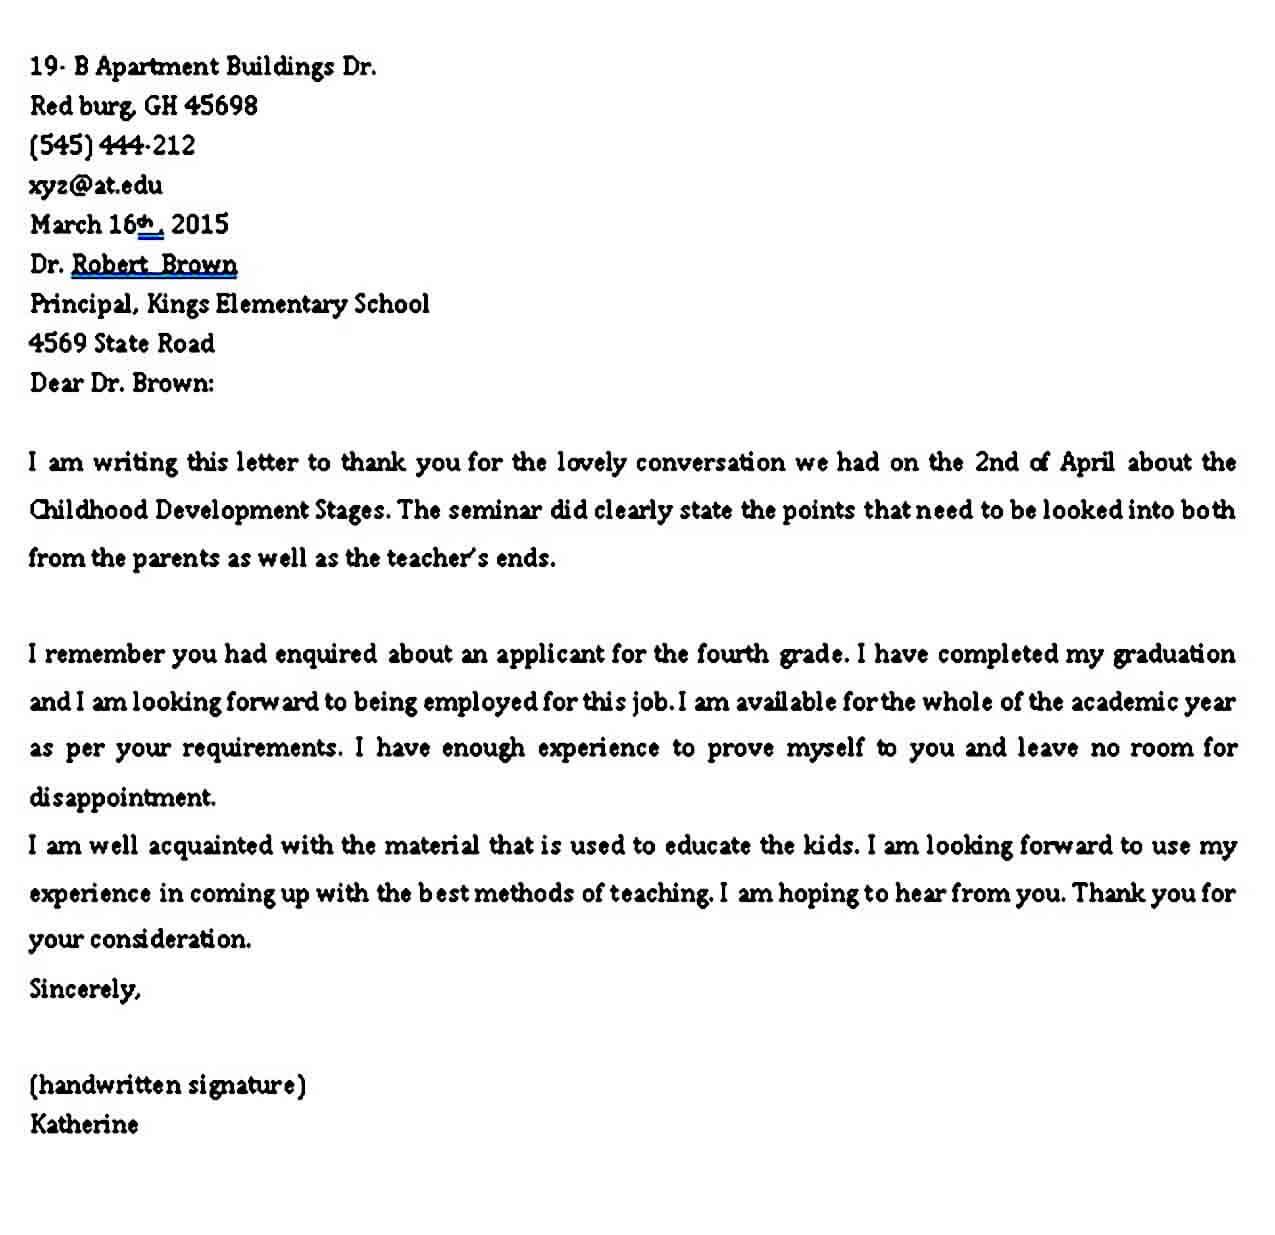 Professional Application letter Format